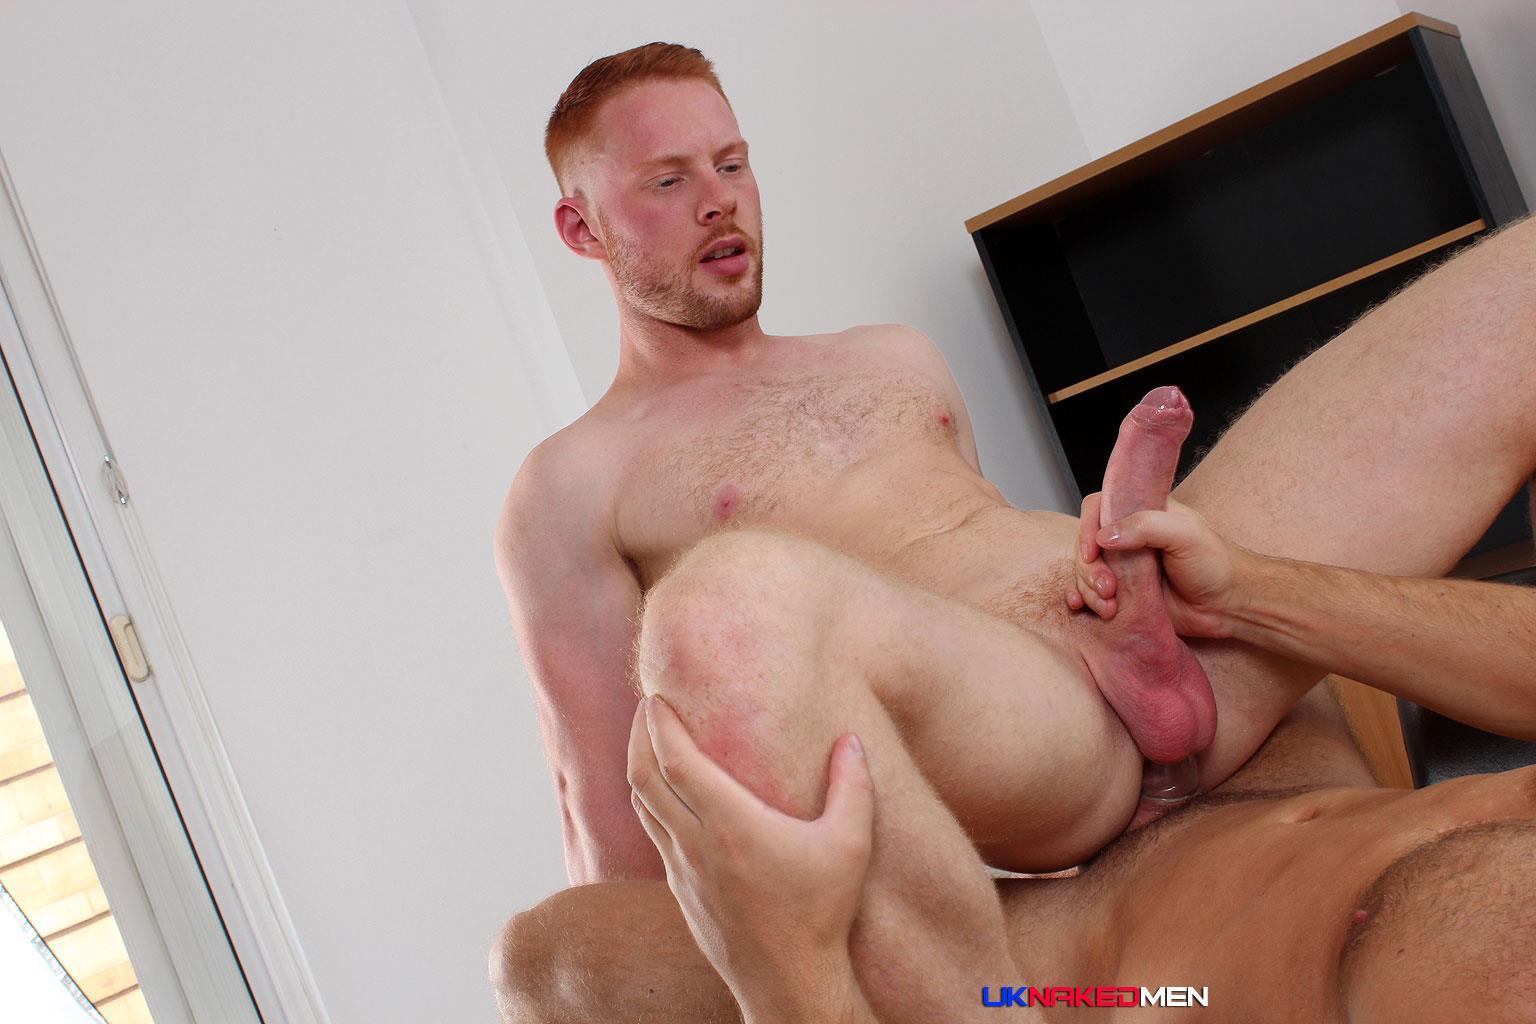 Fucked Up Weird Porn gay guys fucking up the bum - porn clips.